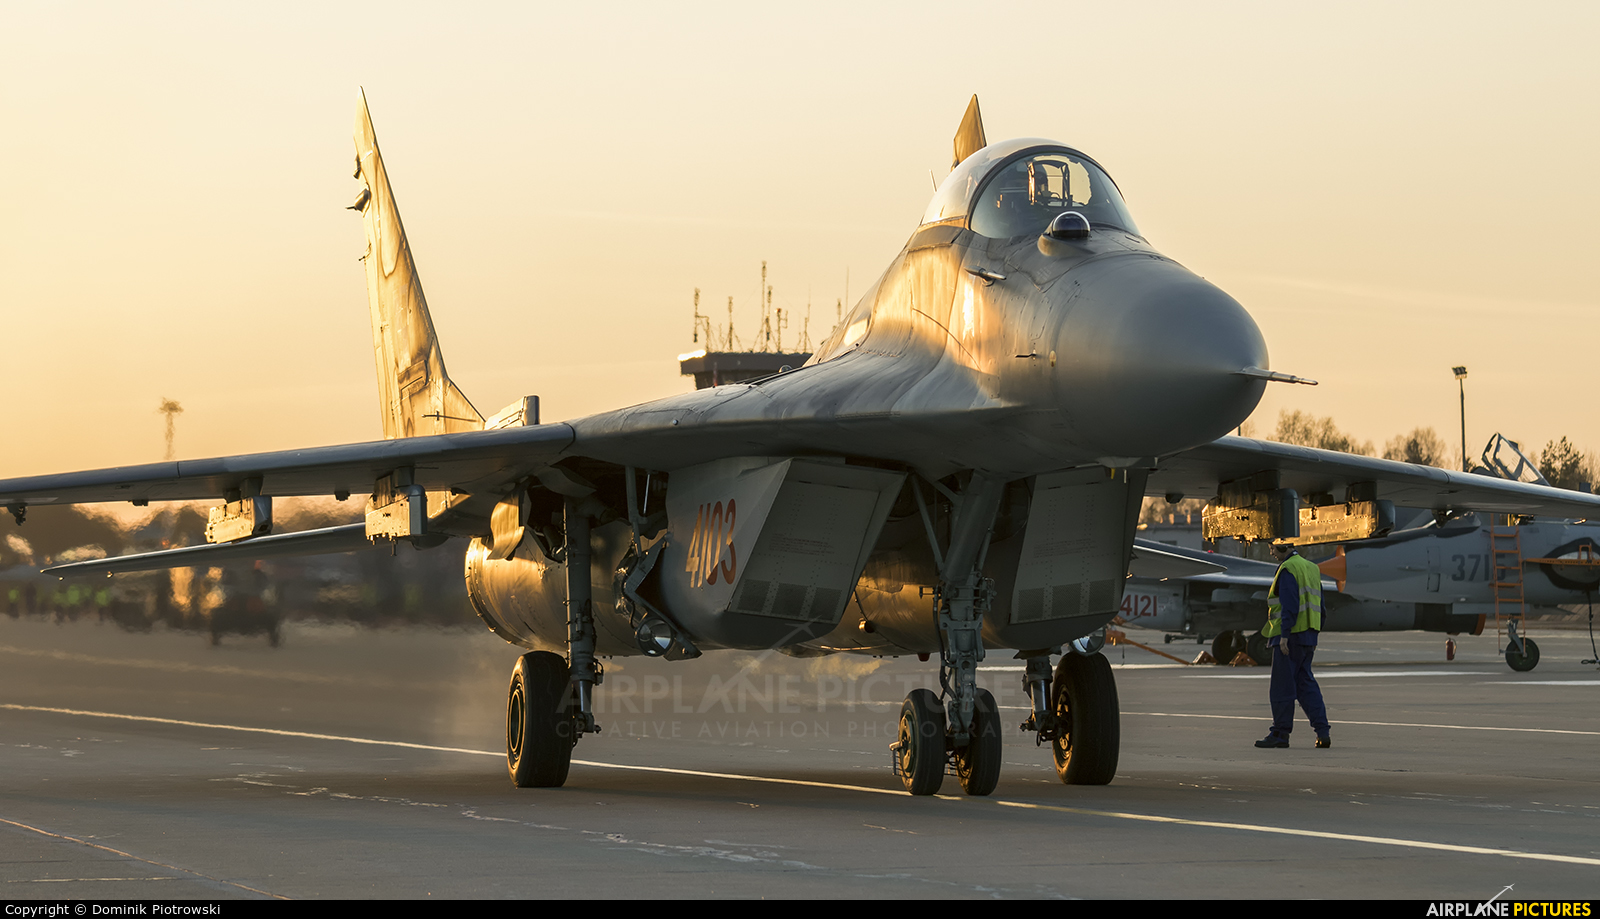 Poland - Air Force 4103 aircraft at Świdwin